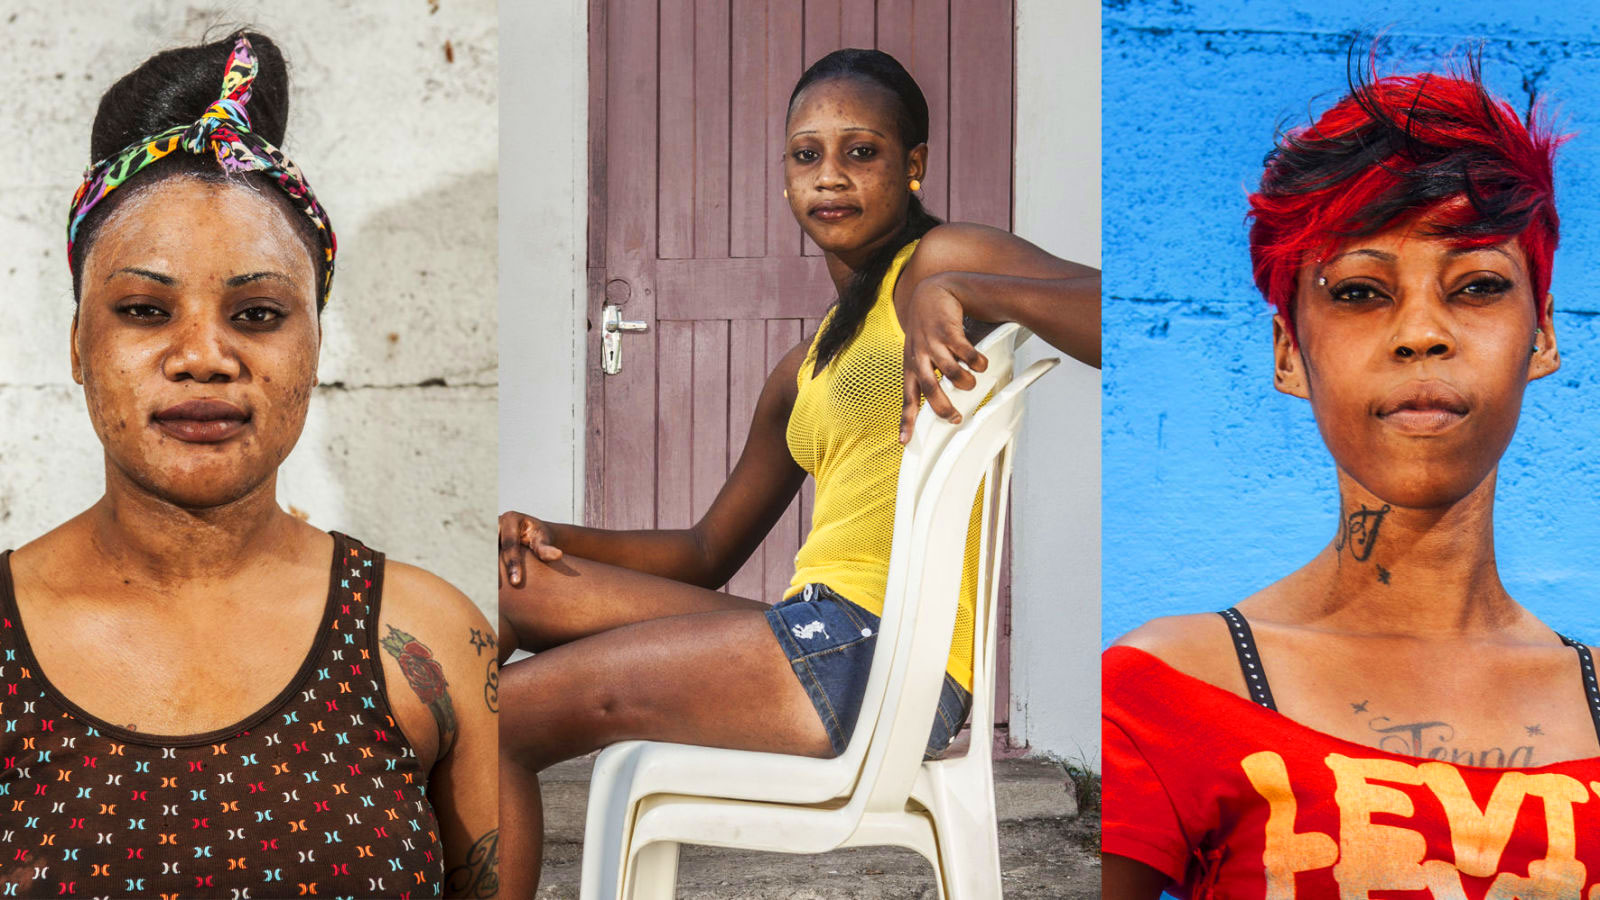 Skin bleaching in Jamaica